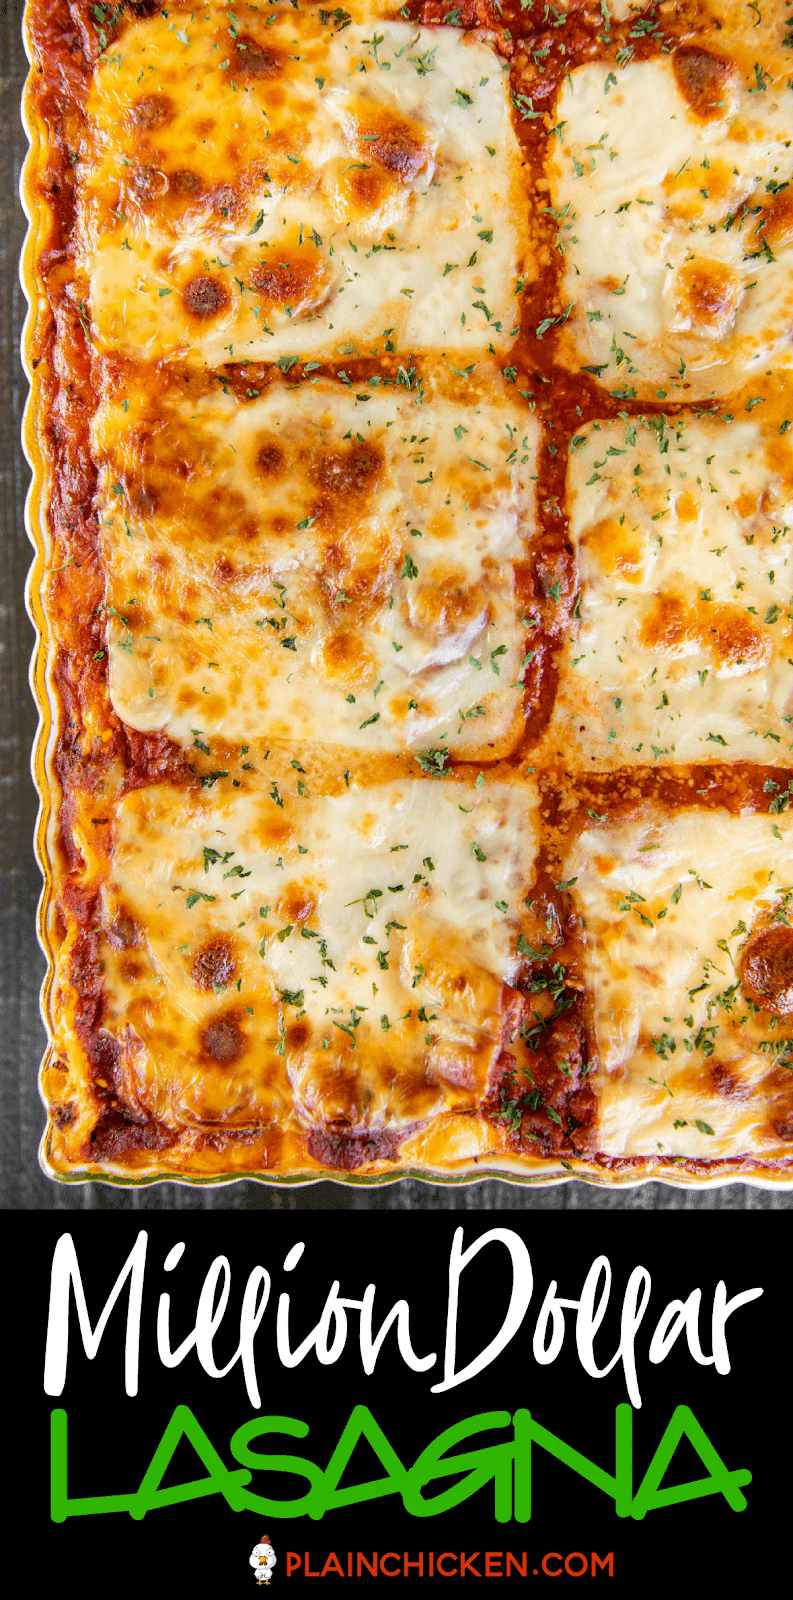 lasagna in a baking dish